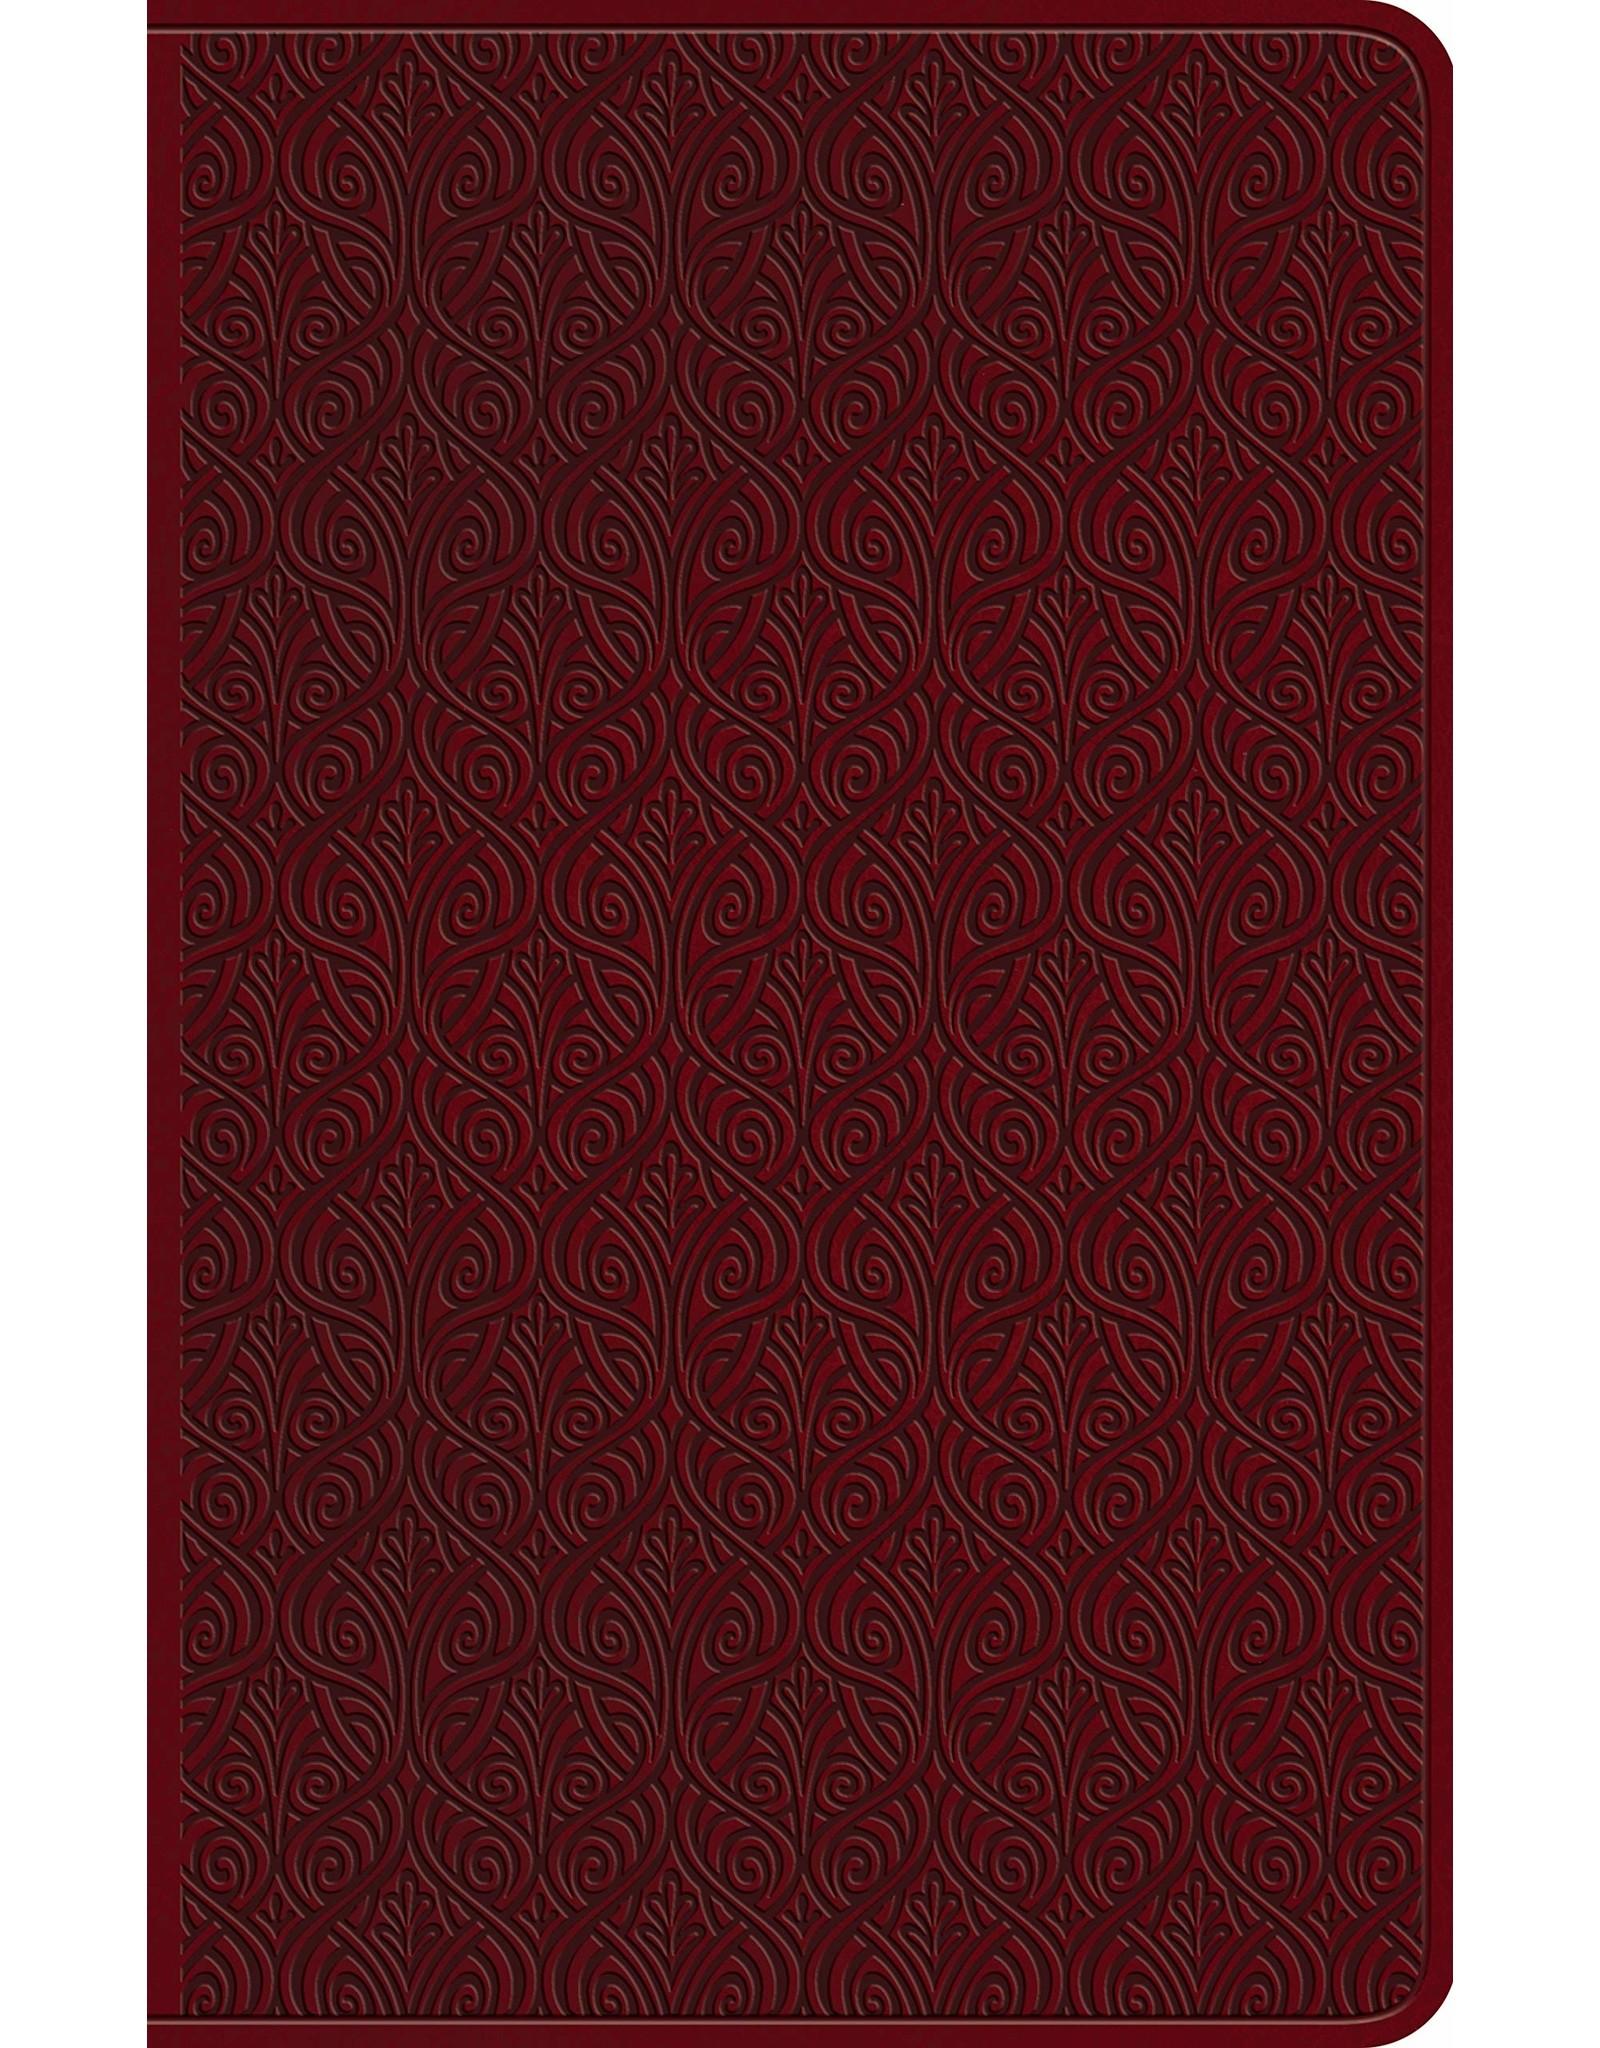 Crossway / Good News ESV Premium Gift Bible-Ruby Vine Design TruTone